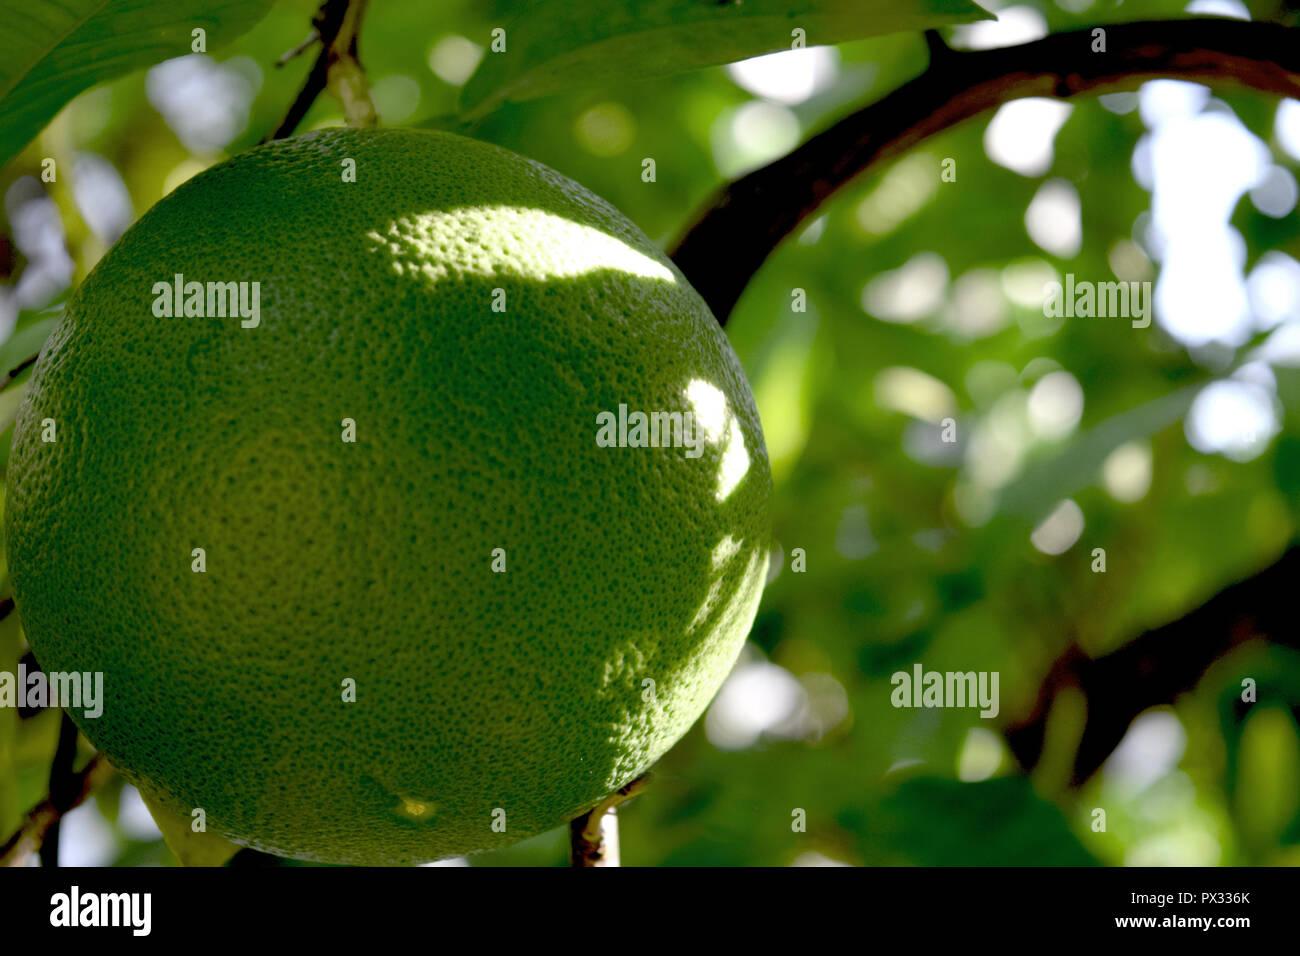 Grapefruit Close Up Fruit Tree Sunny Day - Stock Image